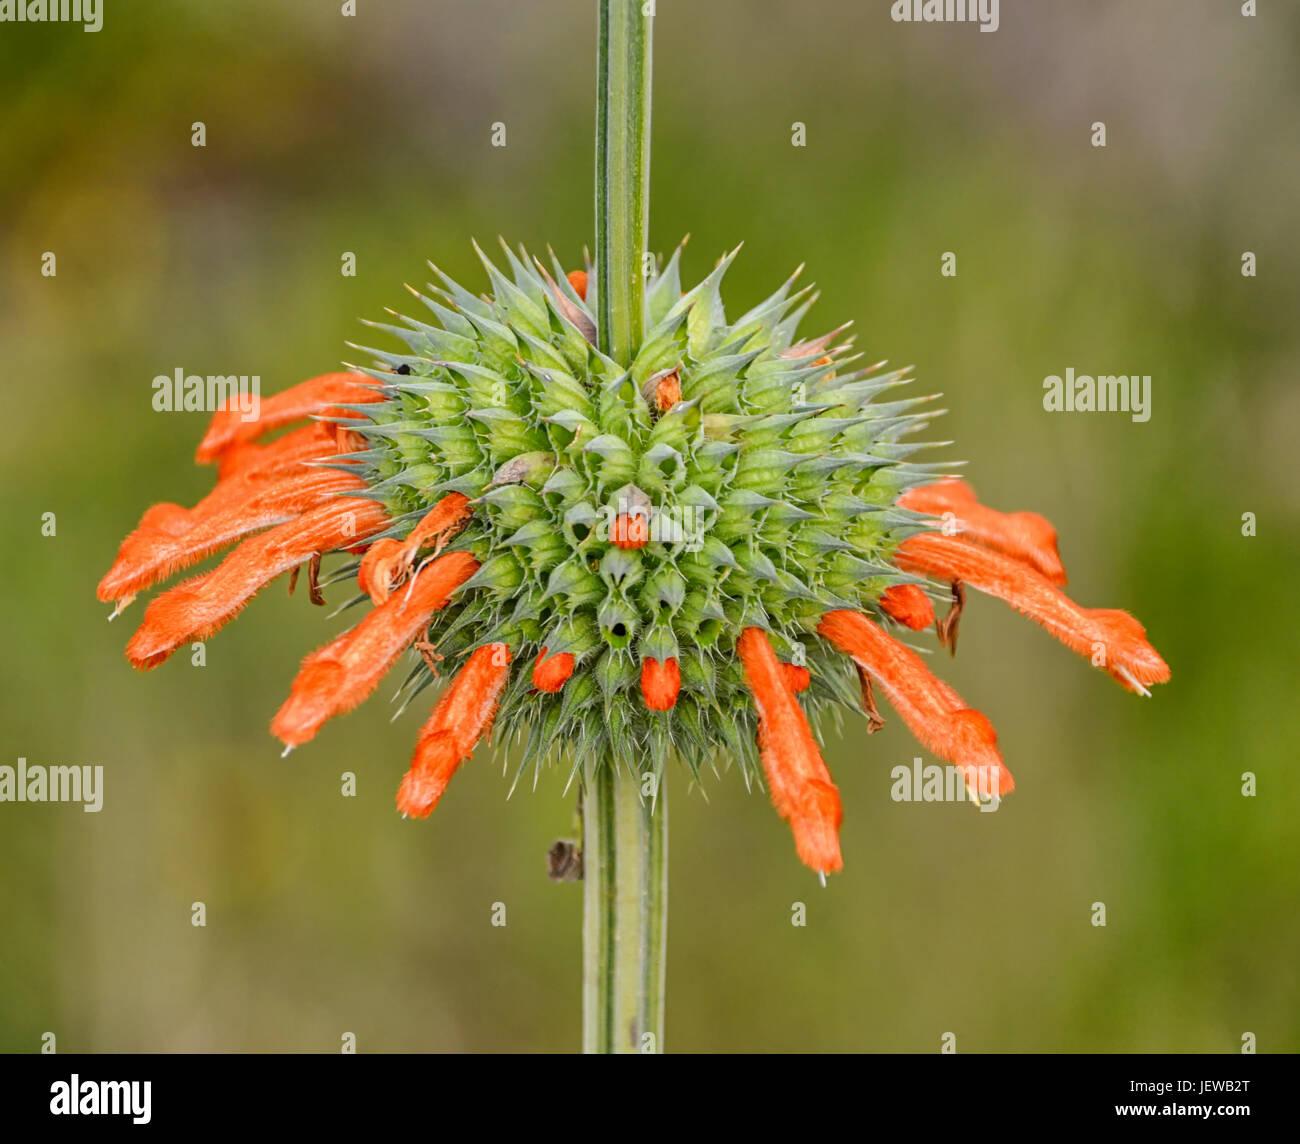 Цветы кларка фото описание